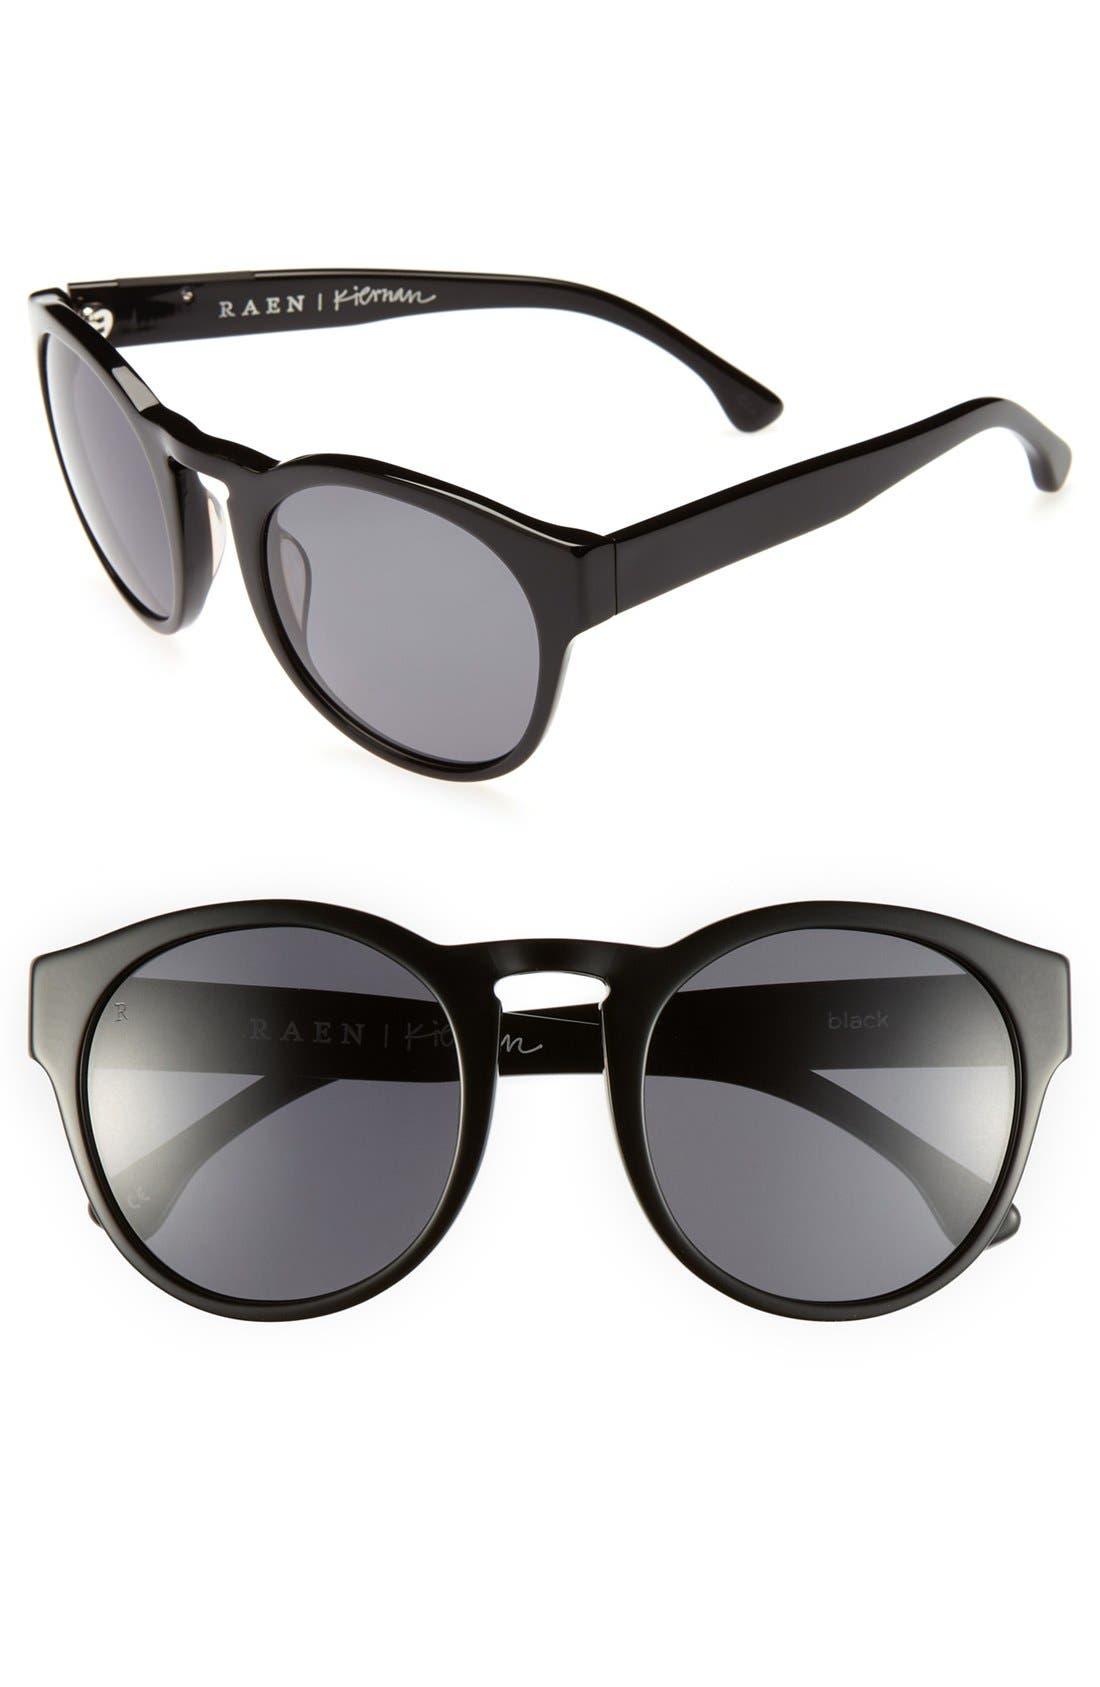 Main Image - RAEN 'Kiernan' 46mm Polarized Sunglasses